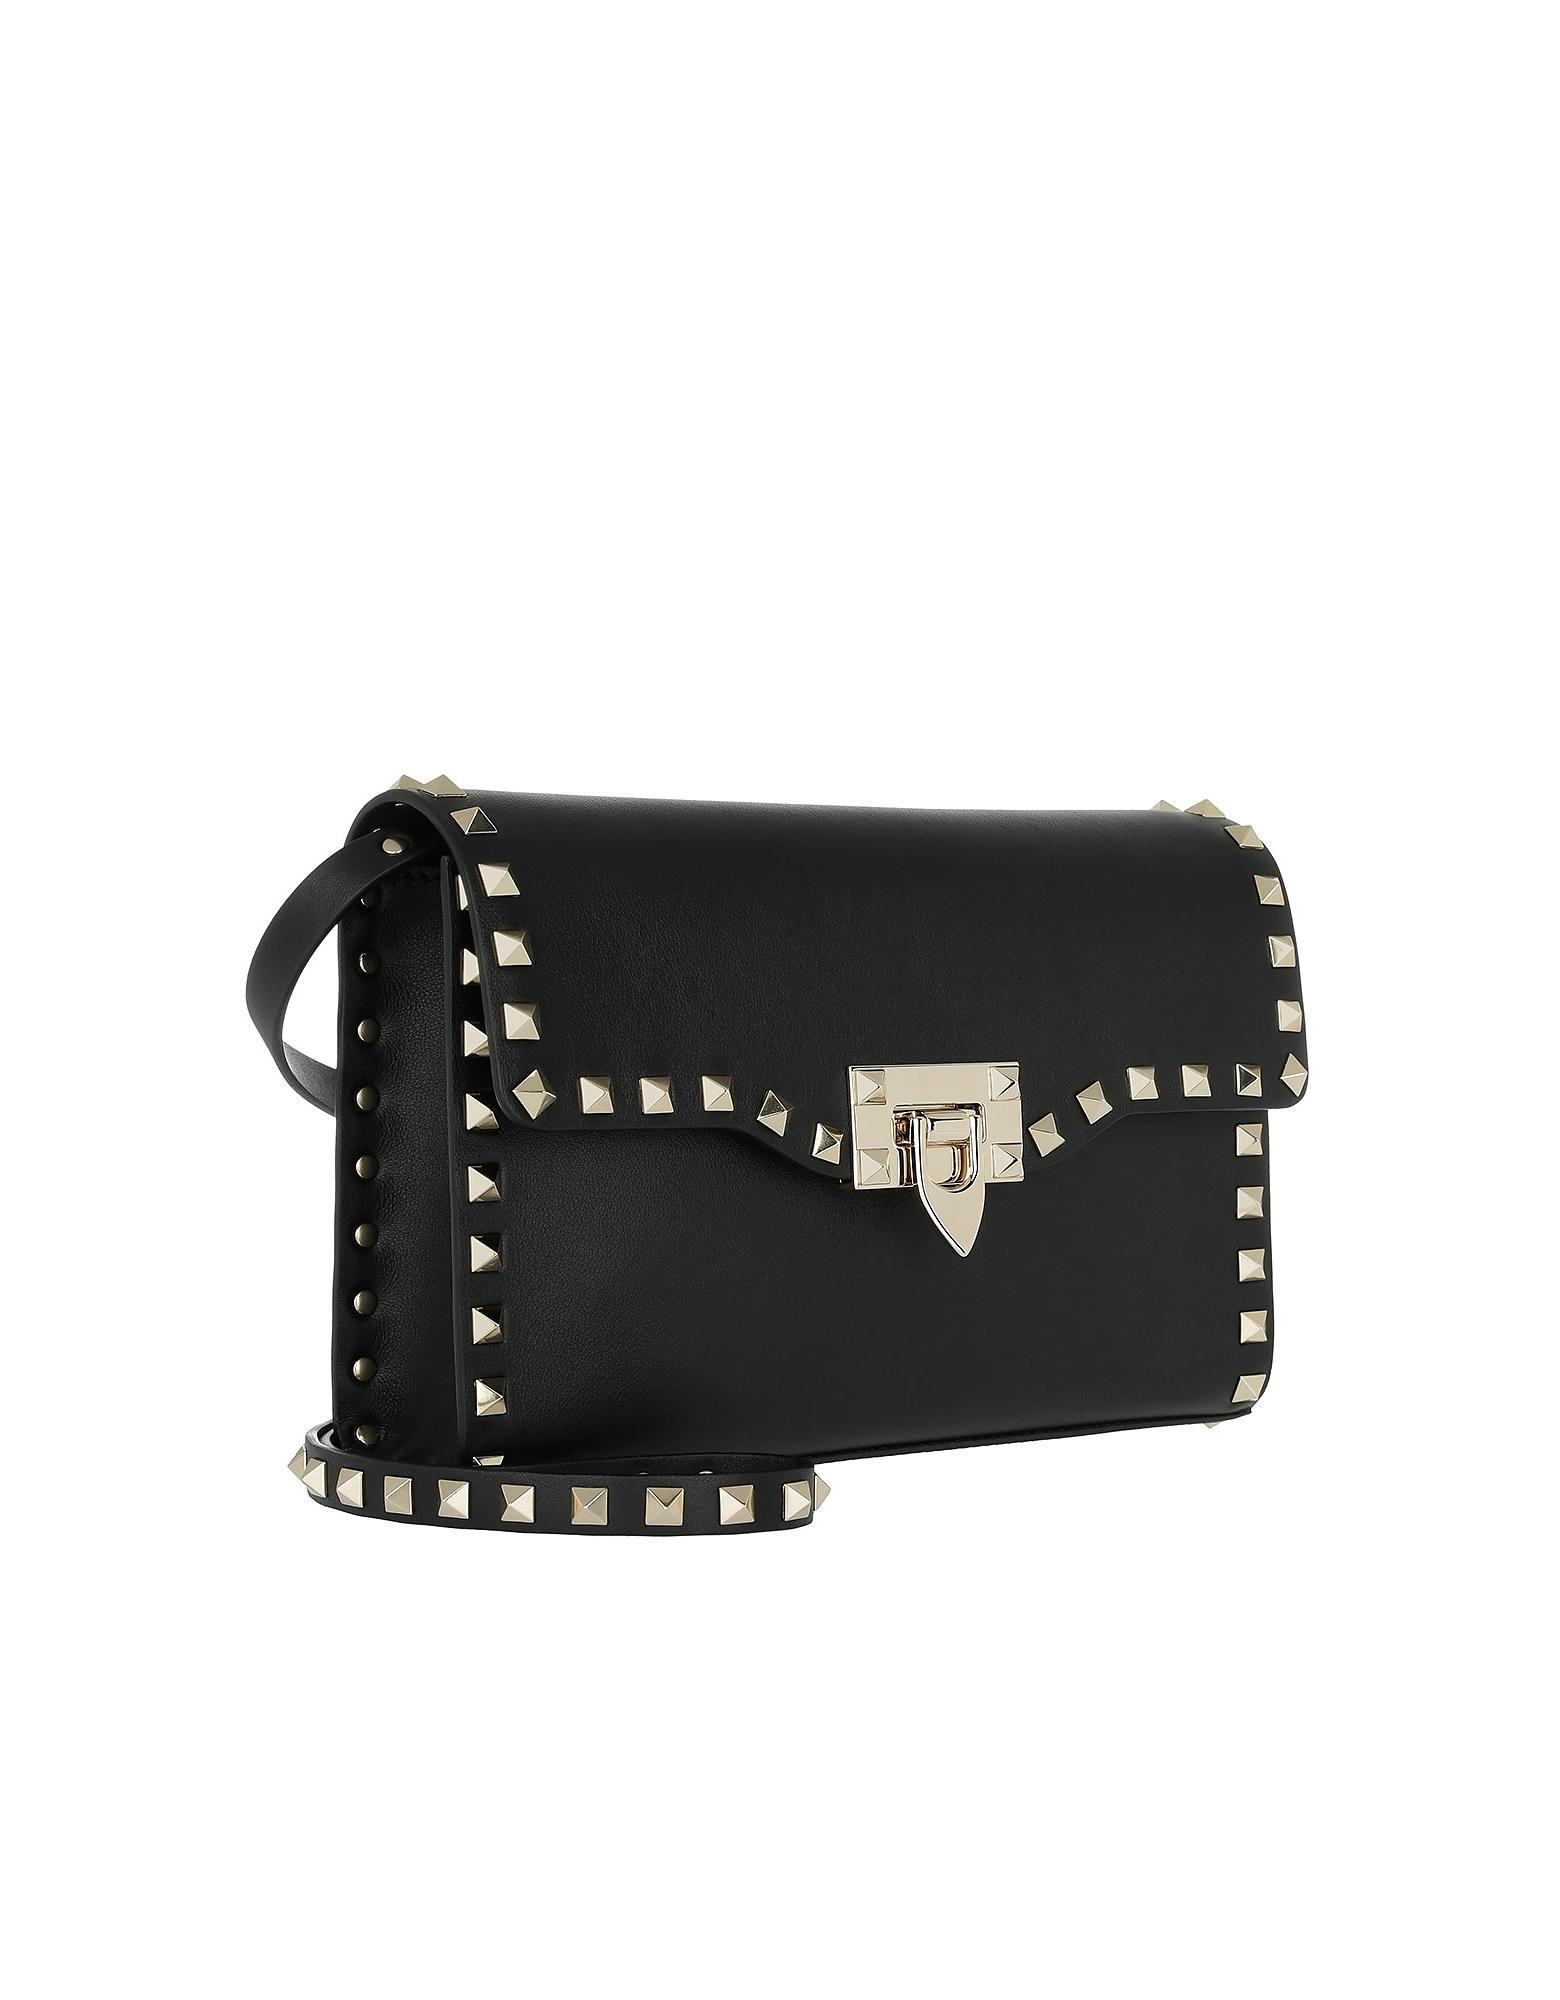 fb58f517f7dd Lyst - Valentino Rockstud Small Crossbody Bag Black in Black